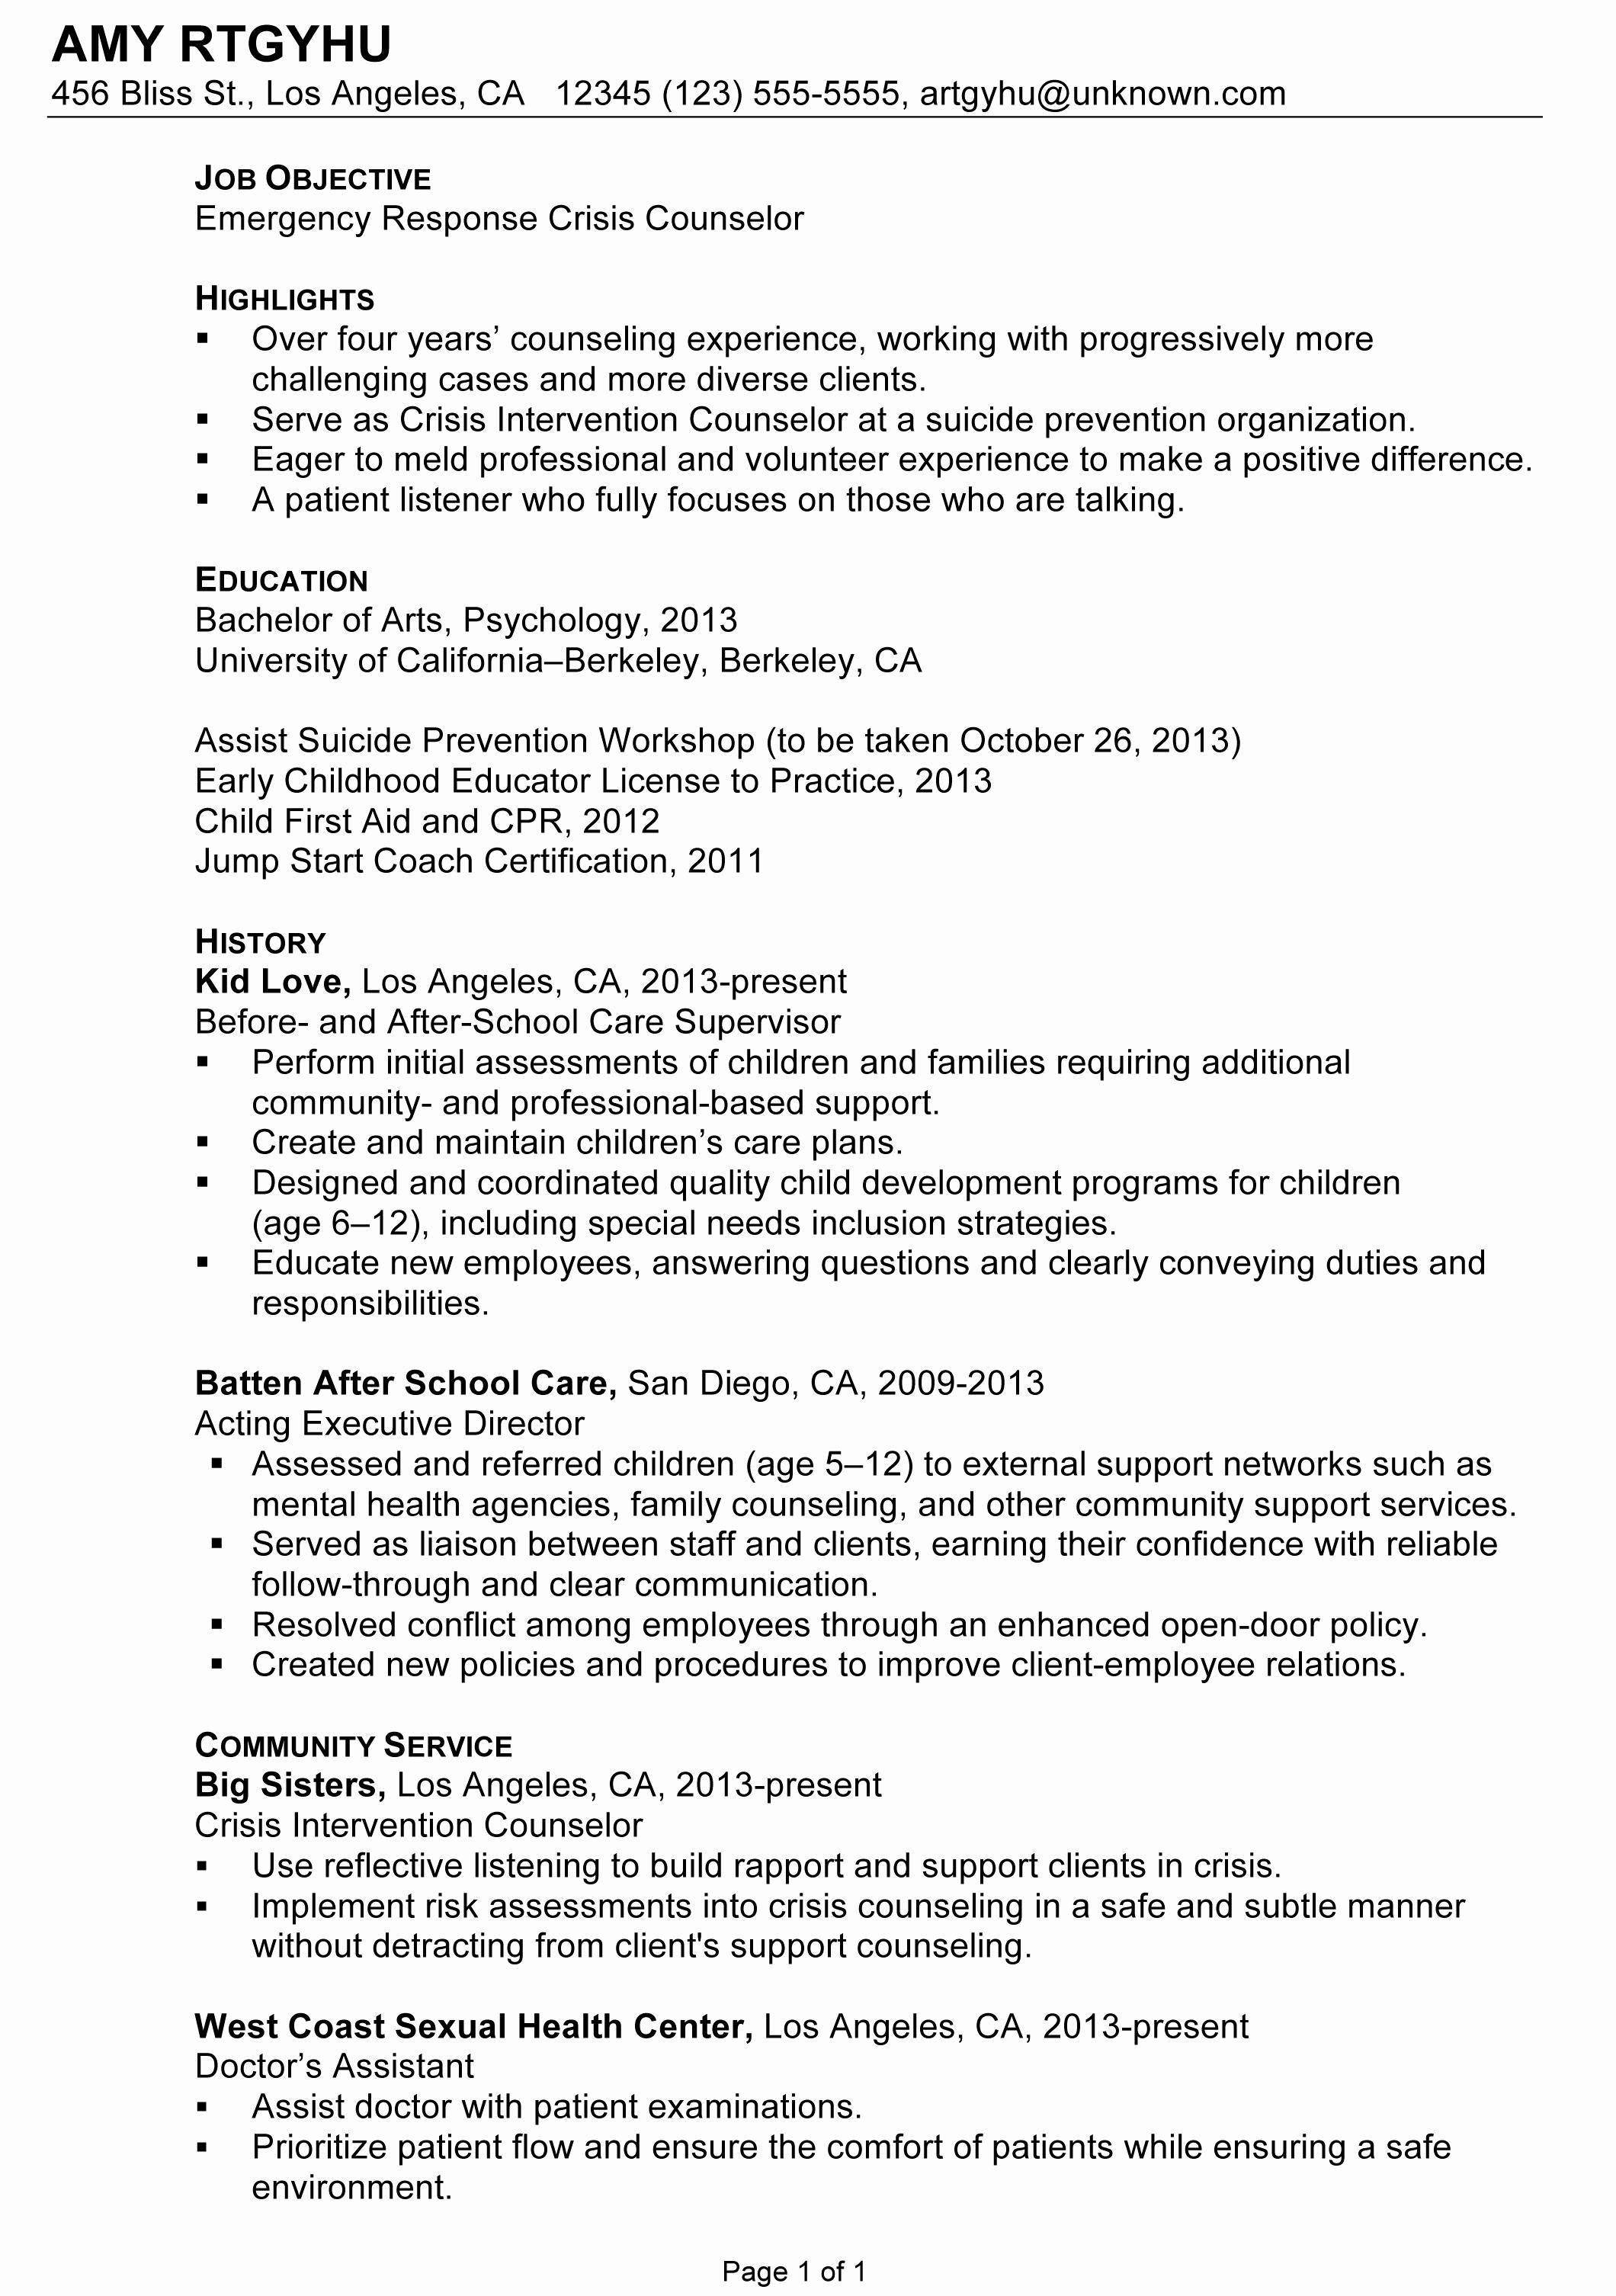 Resume Emergency Response Crisis Counselor Susan